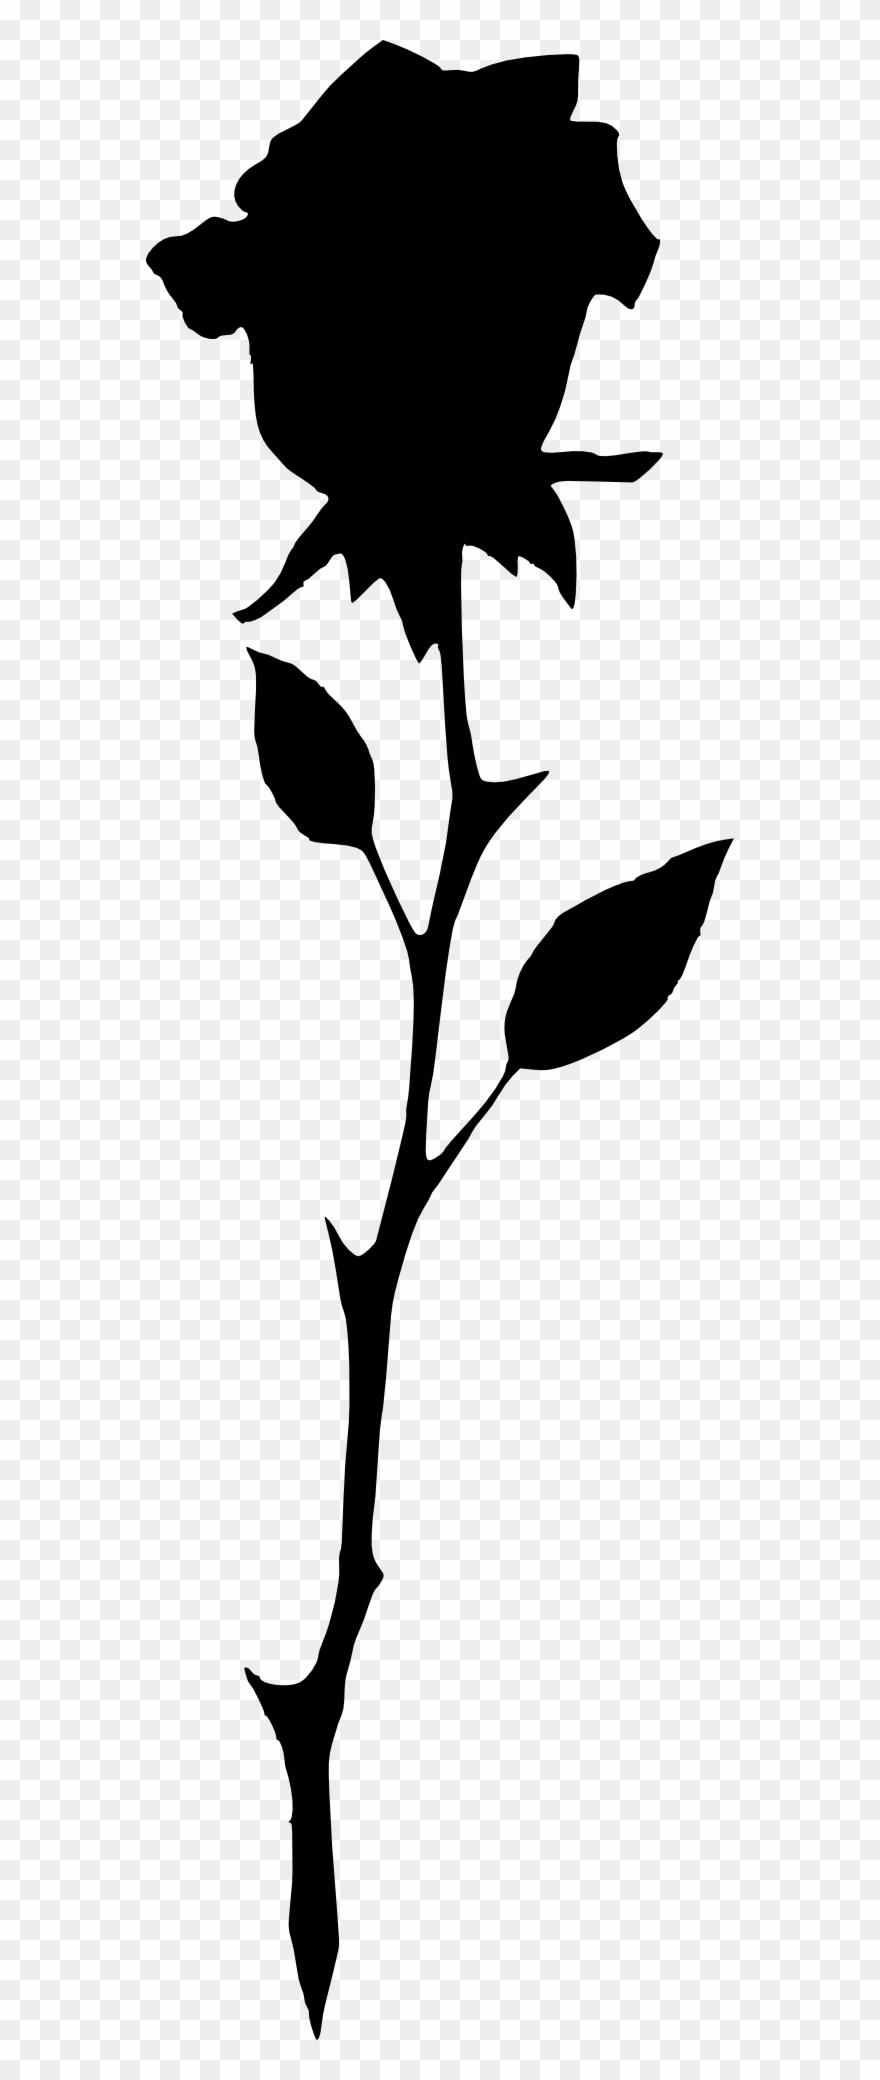 Long Stem Rose Silhouette.